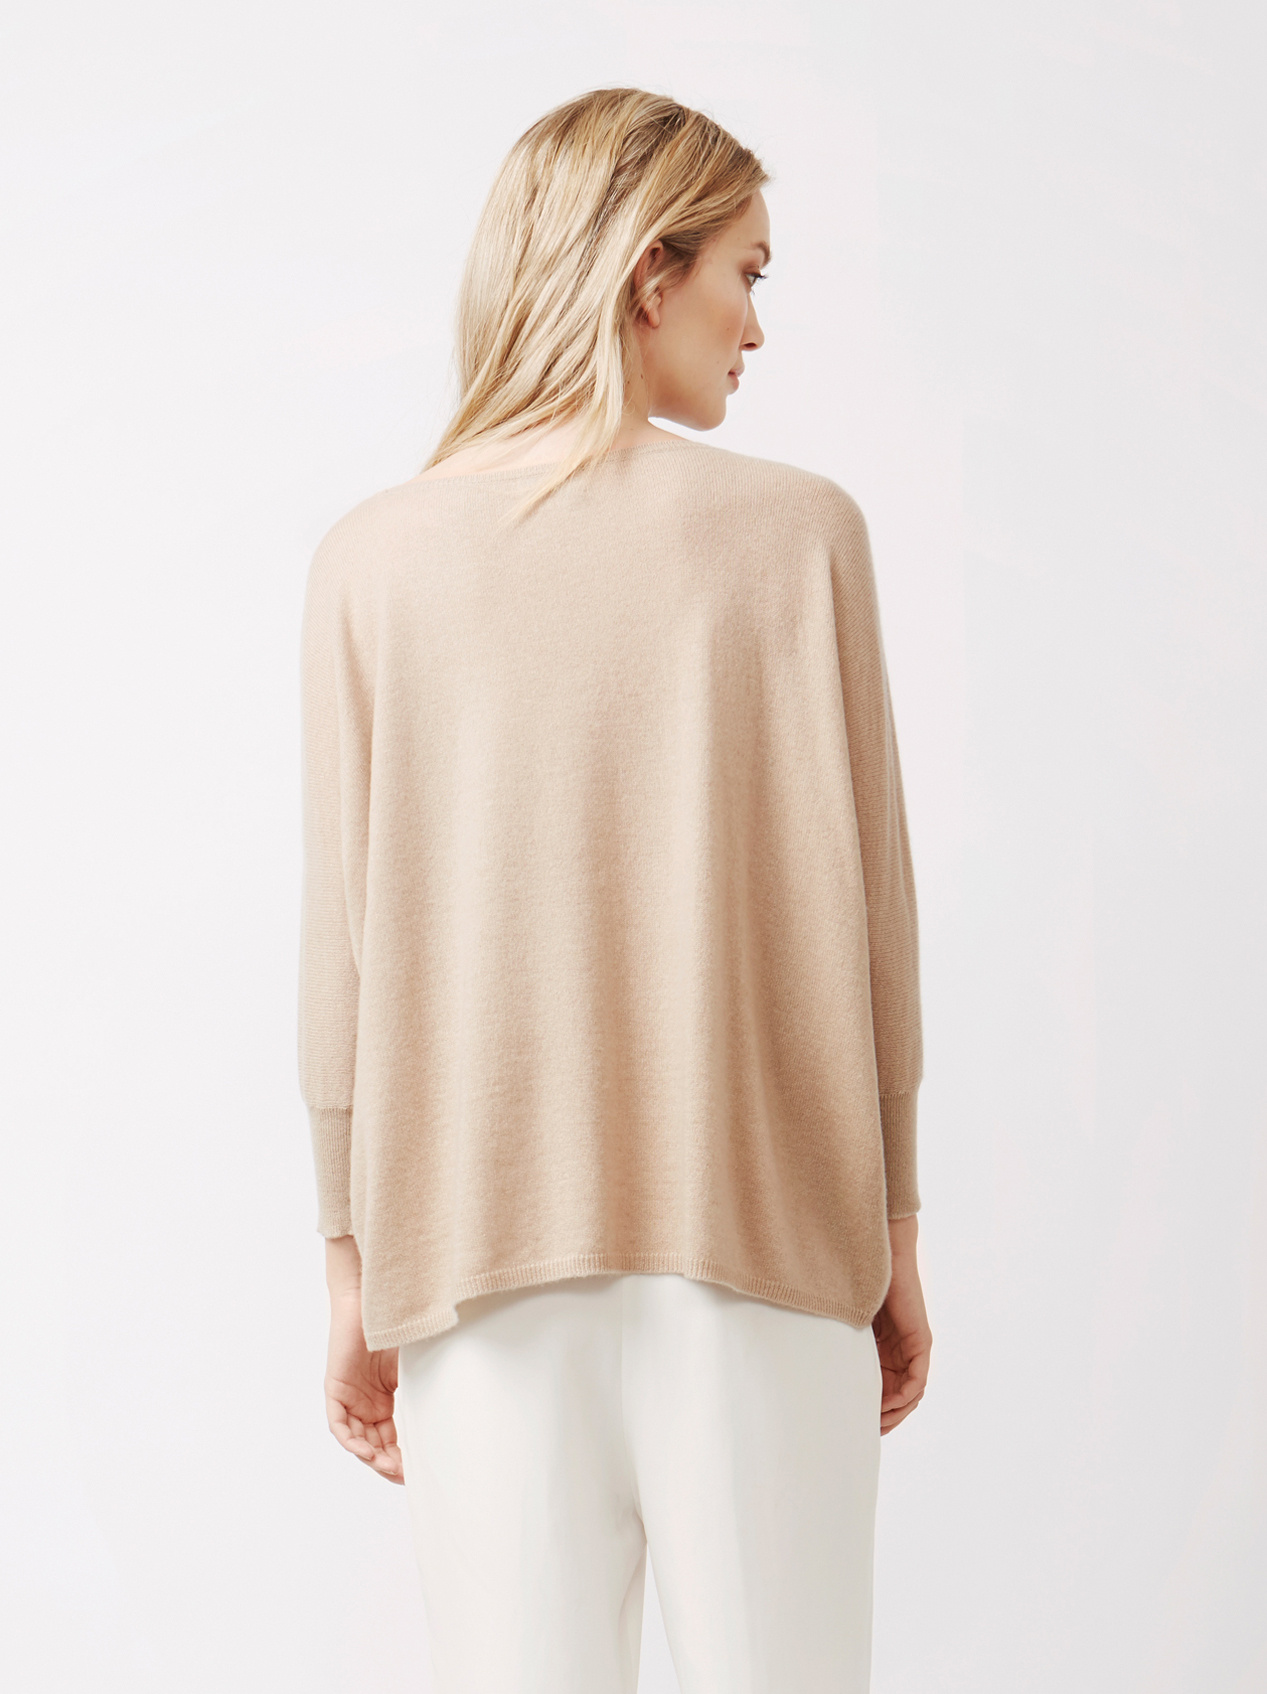 Soft Goat Women's Short Sleeve Poncho Sand